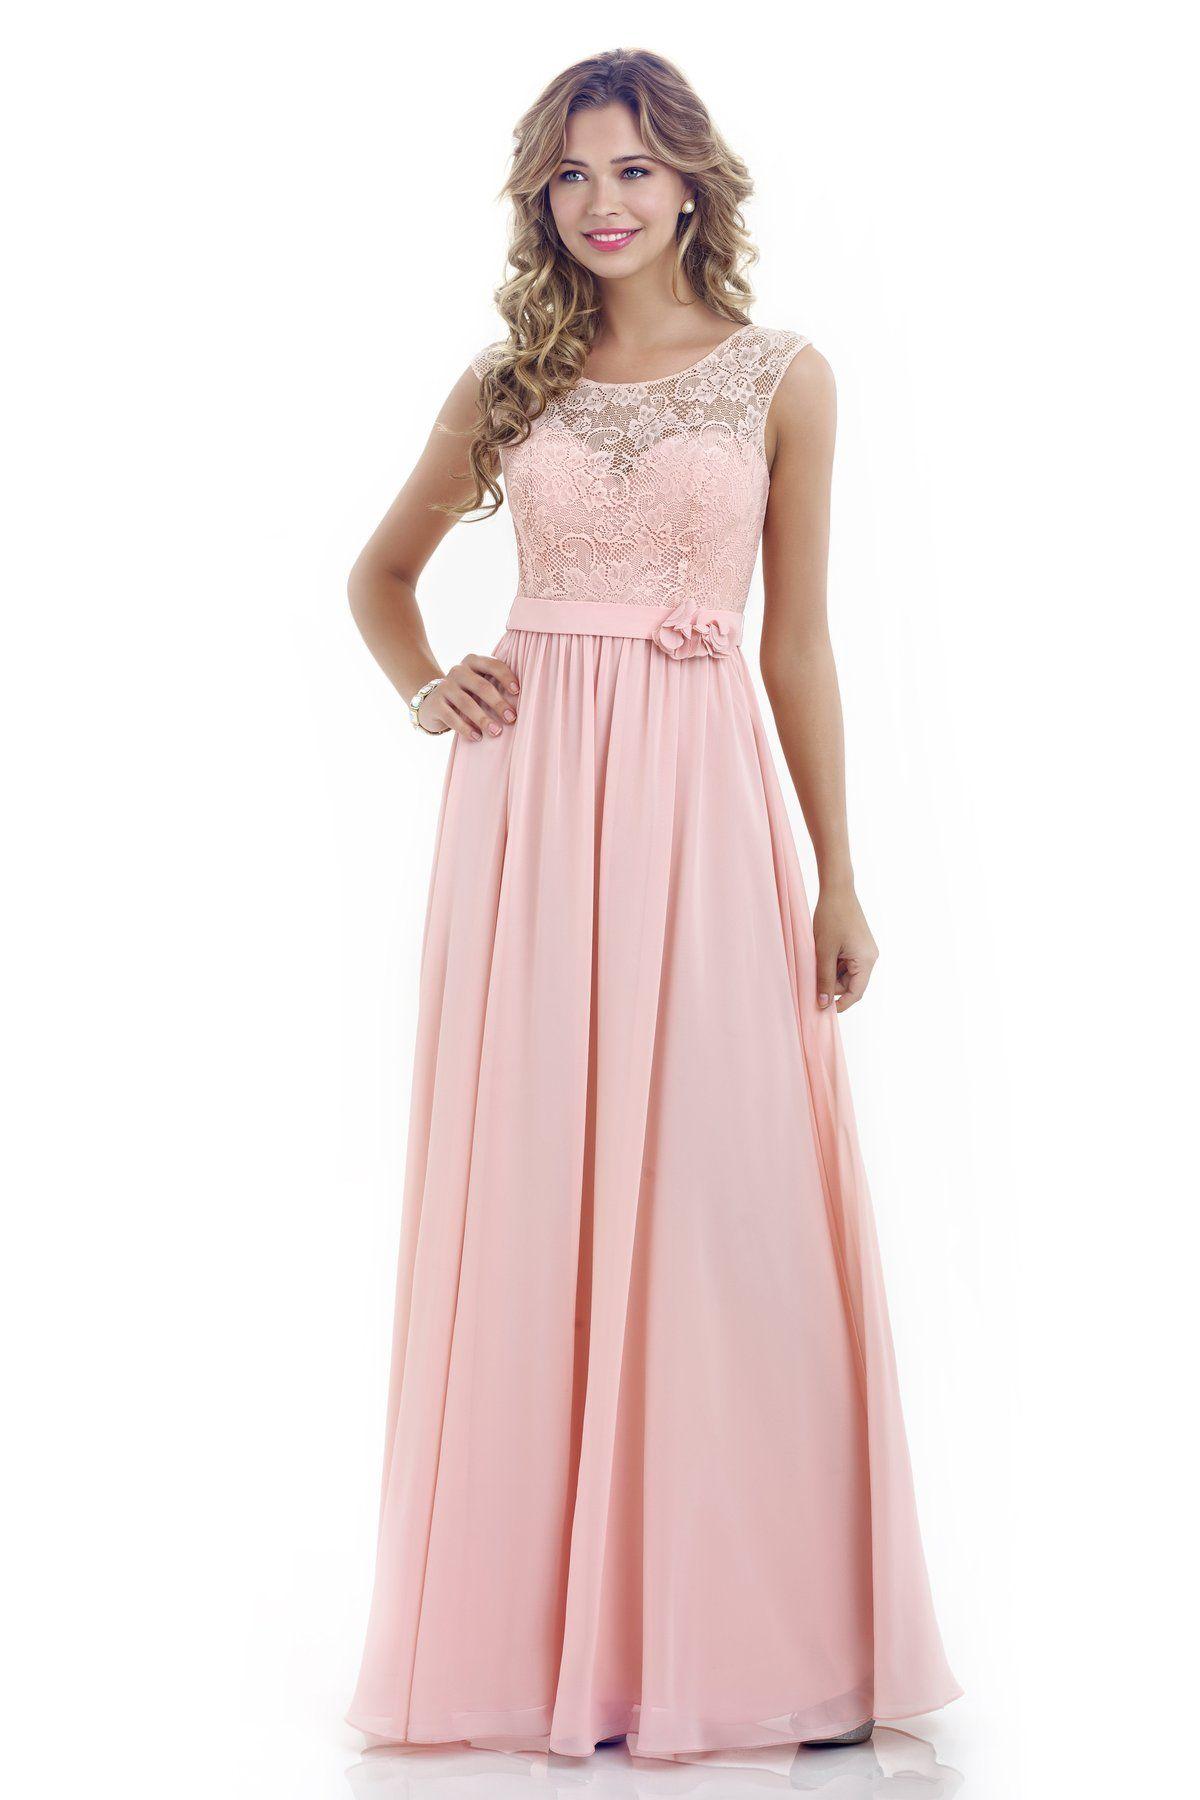 Alexia Designs Style 208l Wedding Dresses Uk Bridesmaid Pink Bridesmaid Dresses